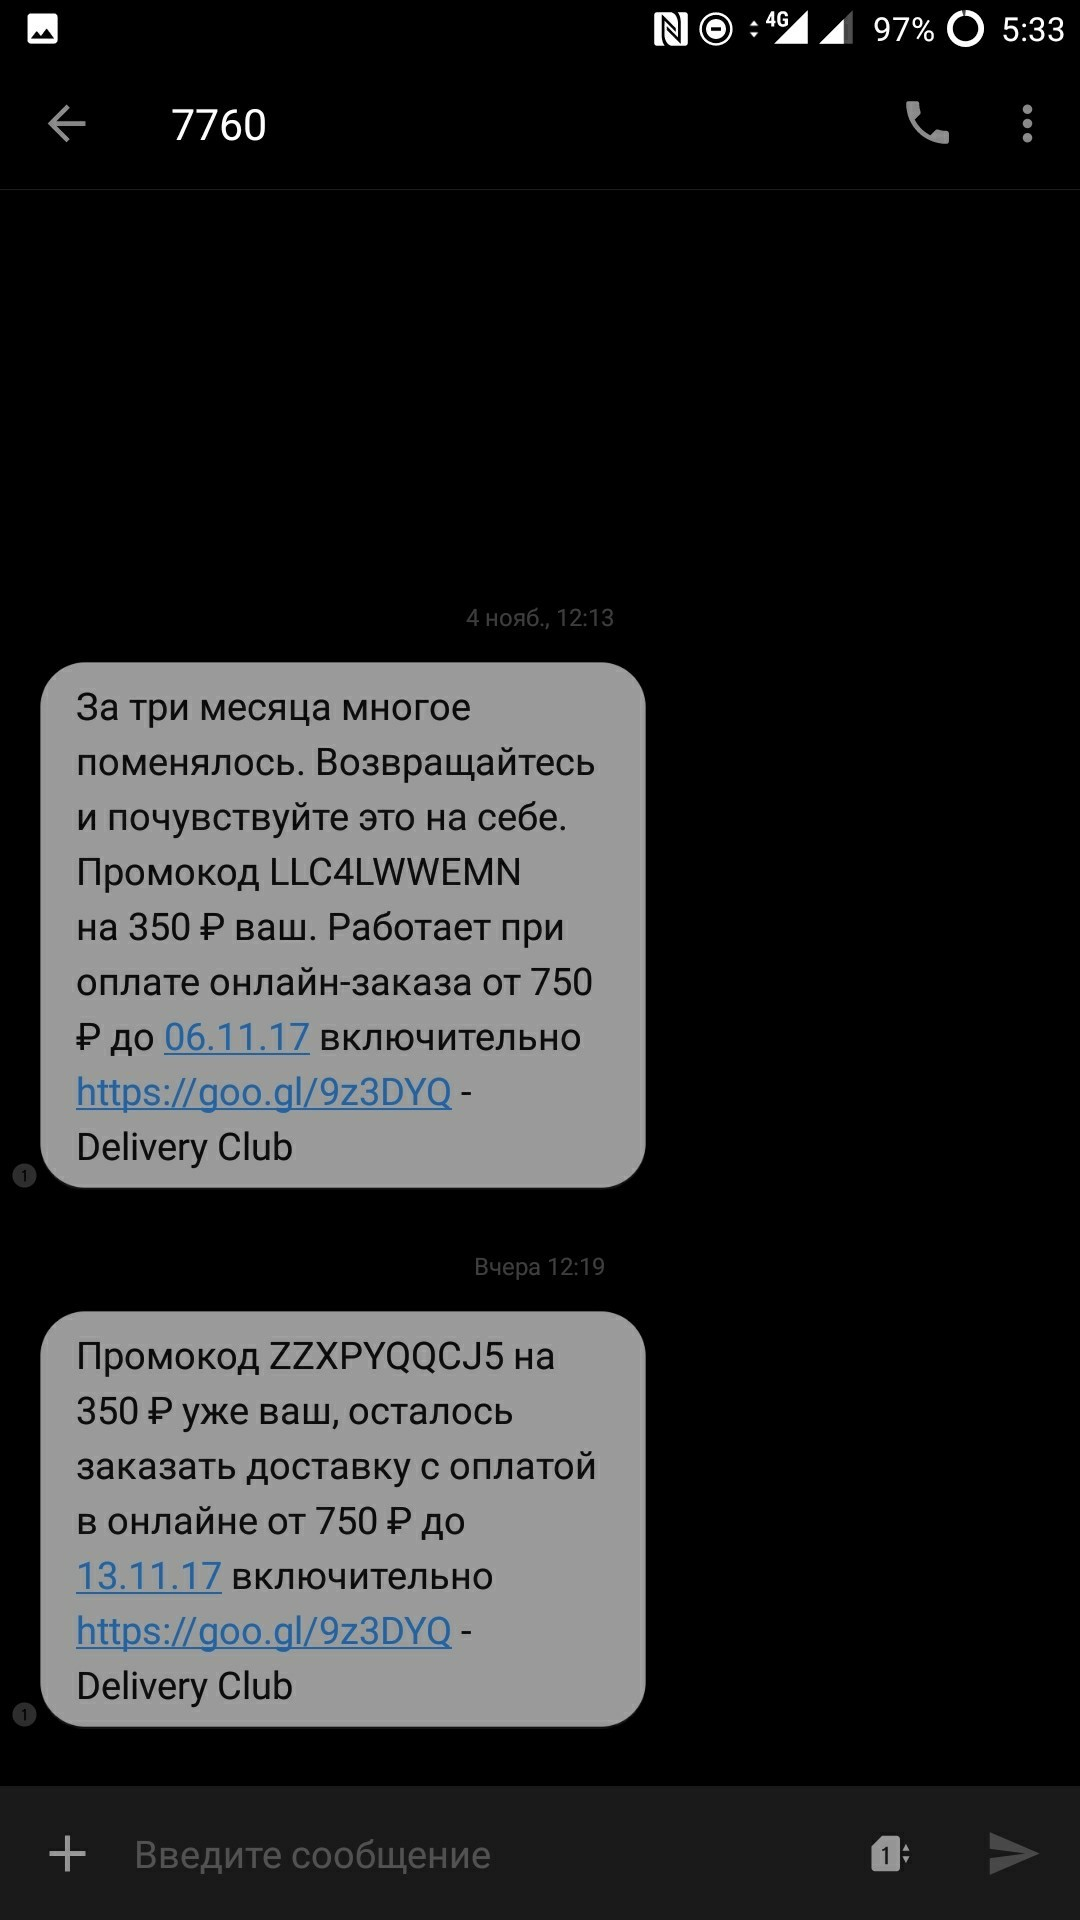 Промокод Delivery Club 100Р на все февральмарт 2018